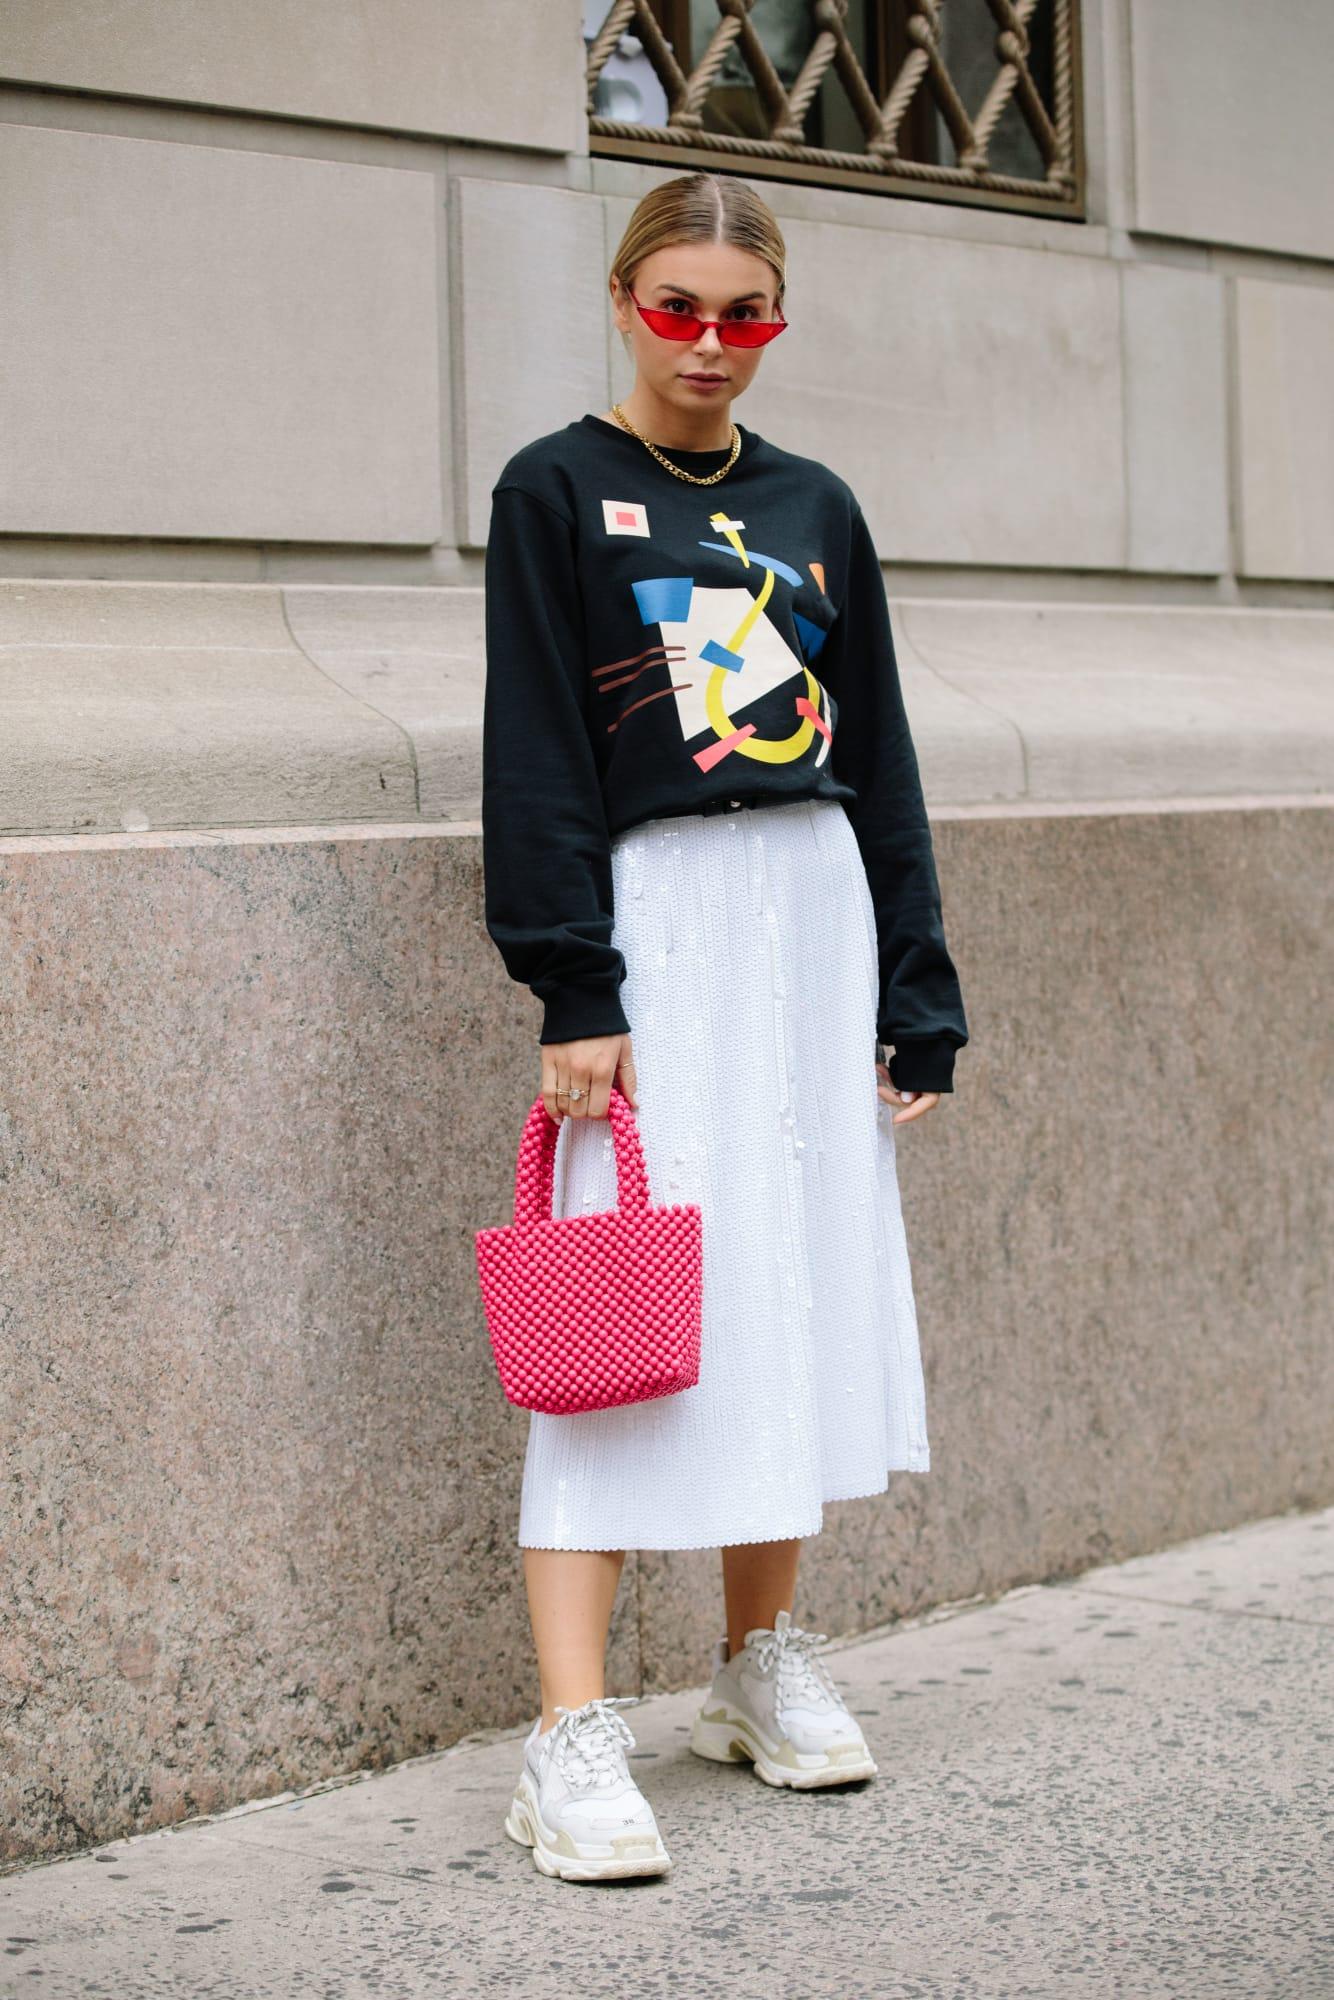 new-york-fashion-week-street-style-spring-2019-day-3-4.jpg